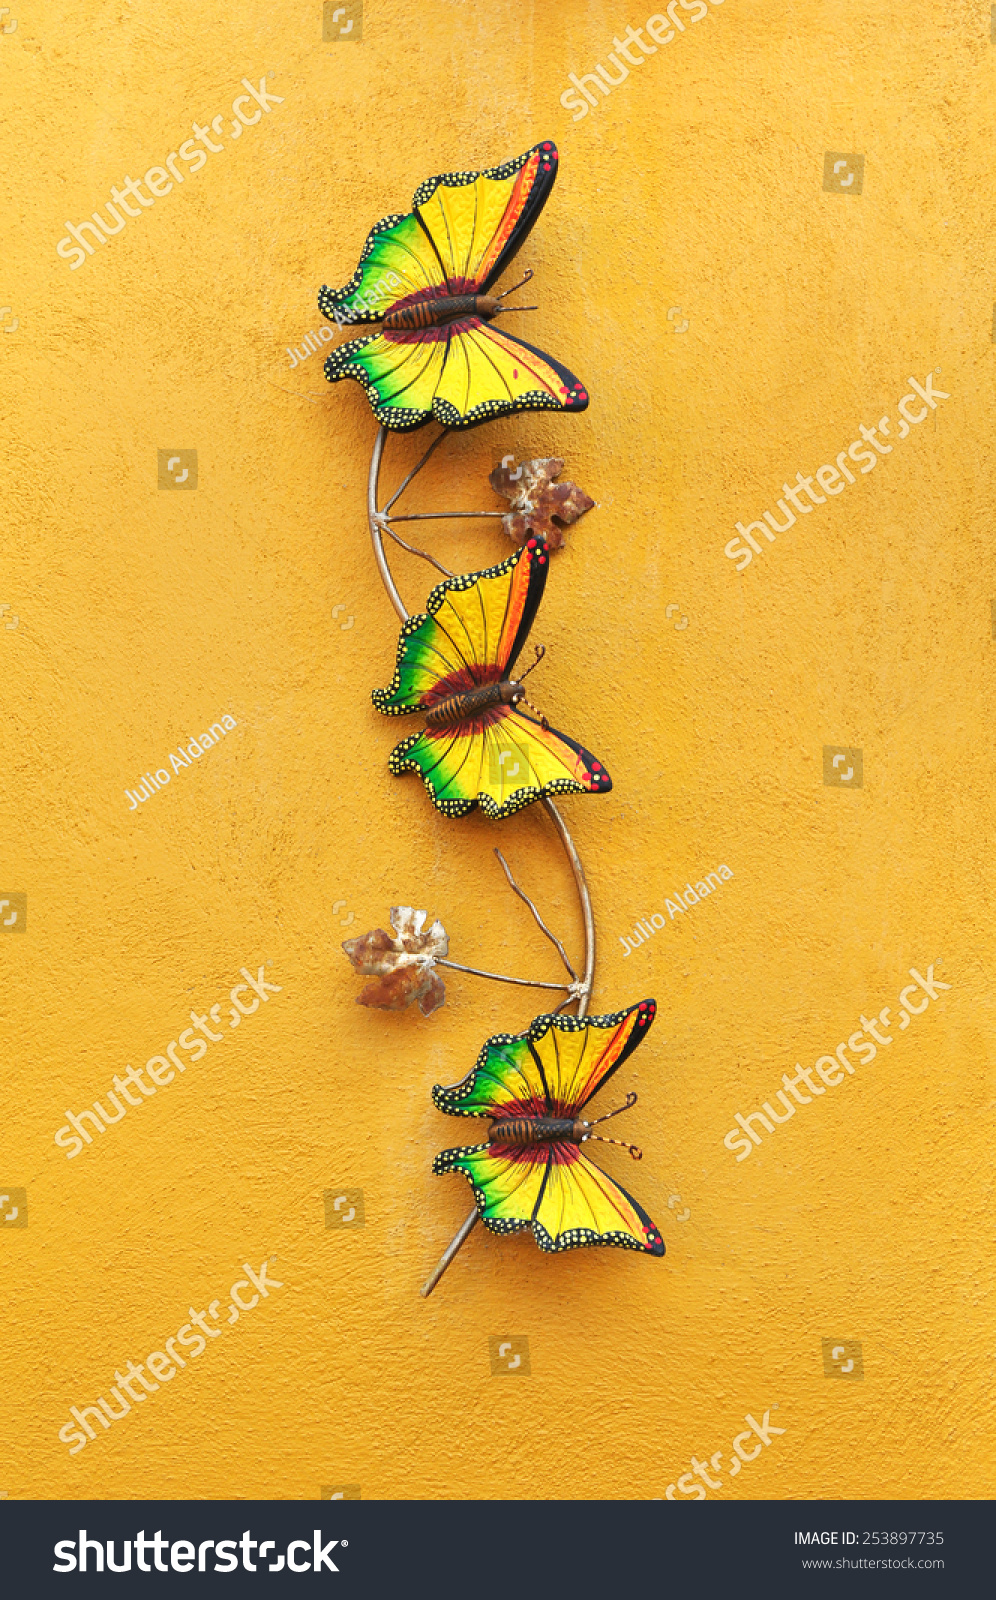 Generous Decorative Wall Butterflies Gallery - The Wall Art ...